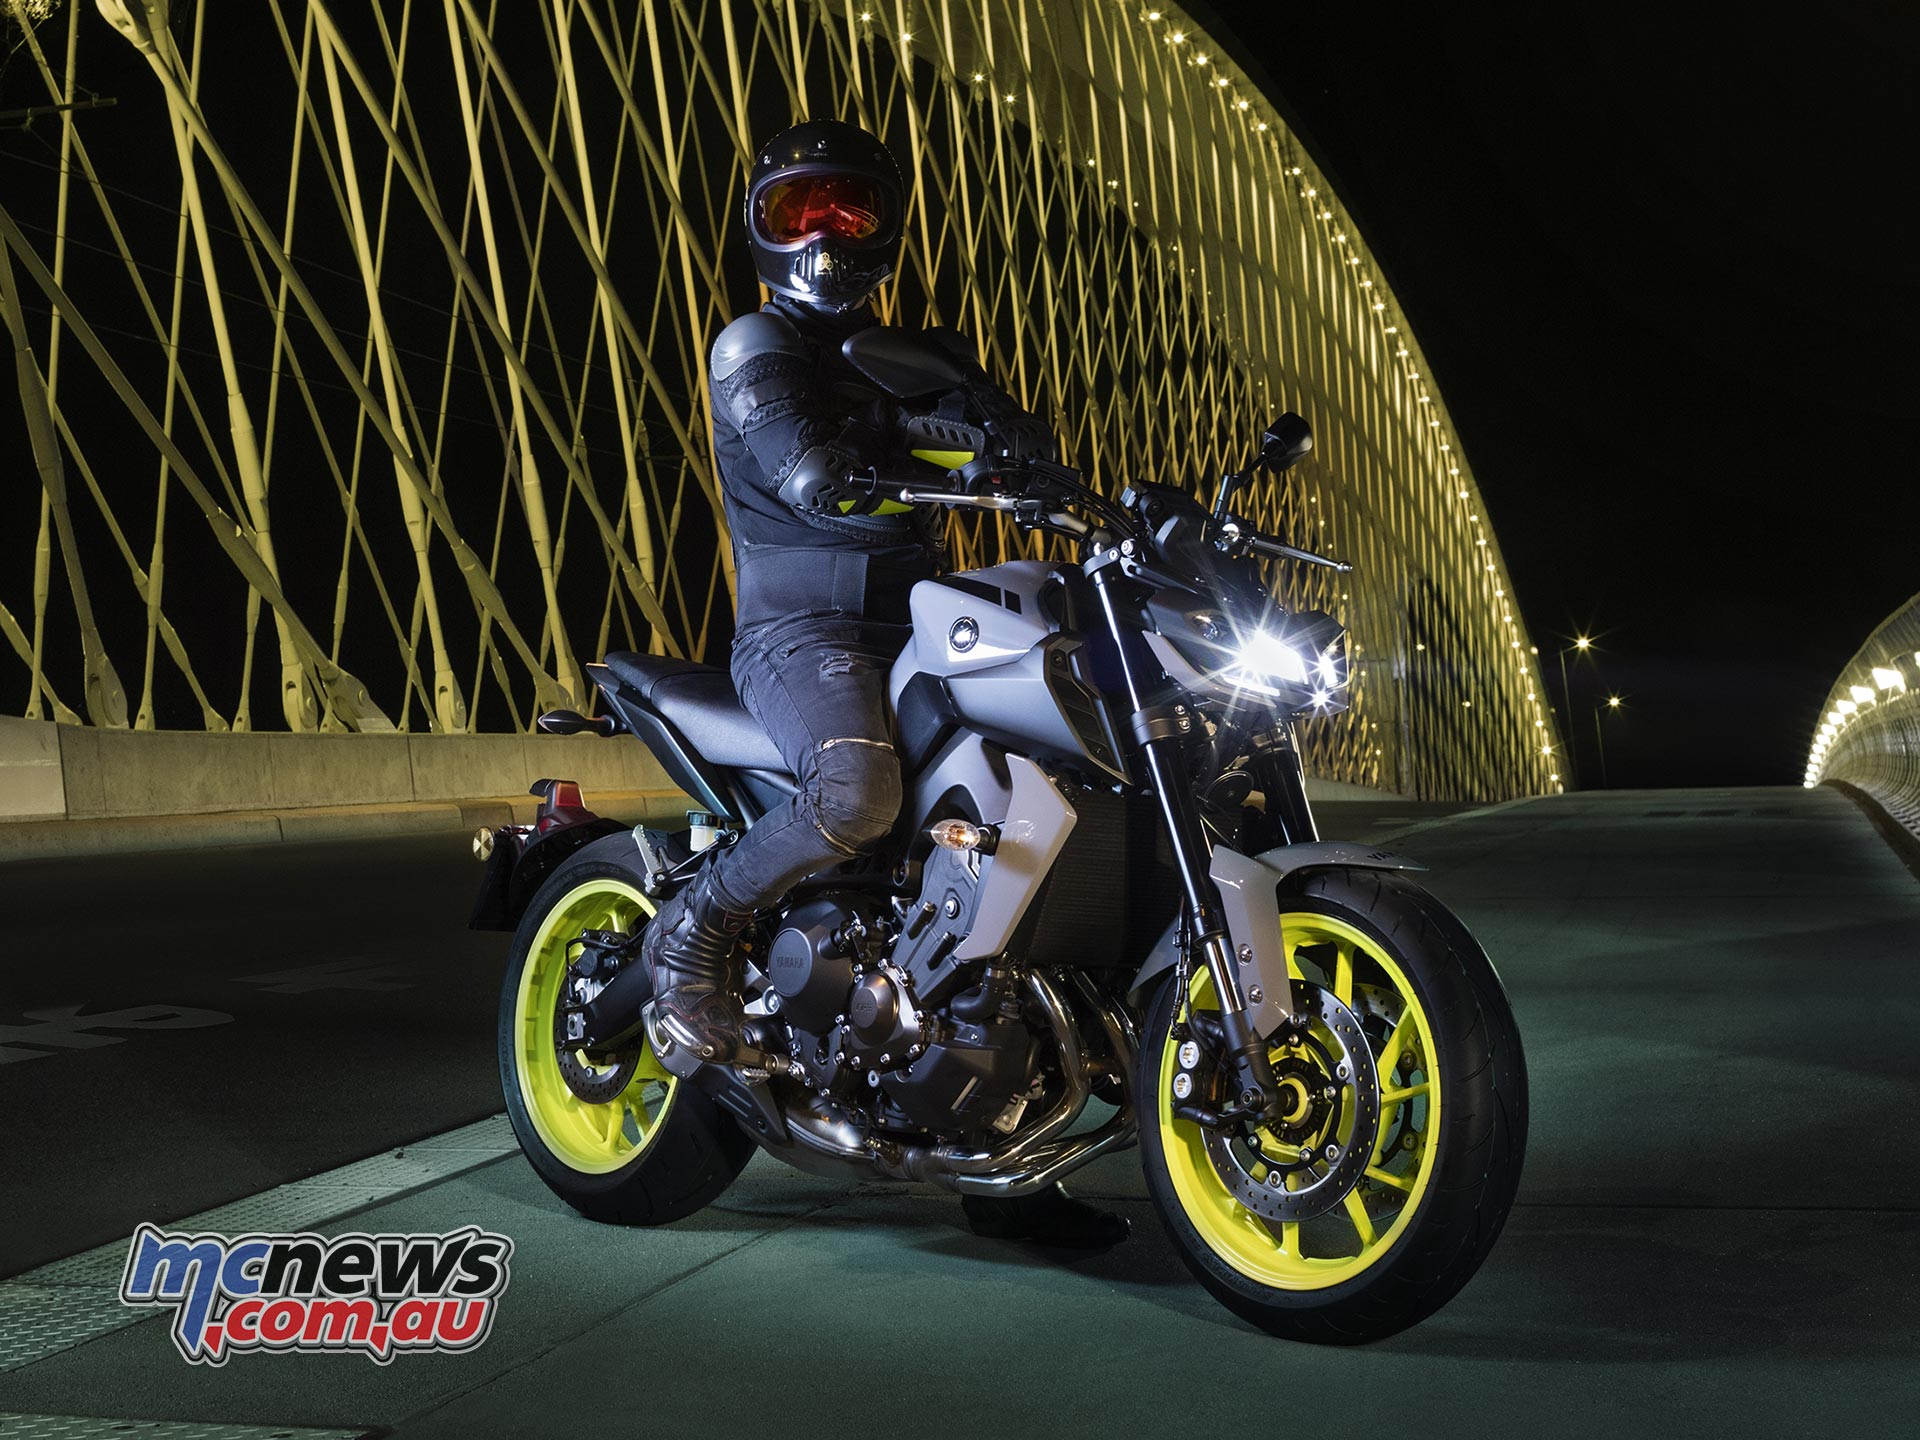 Yamaha MT-09 2017 • The Bike Market